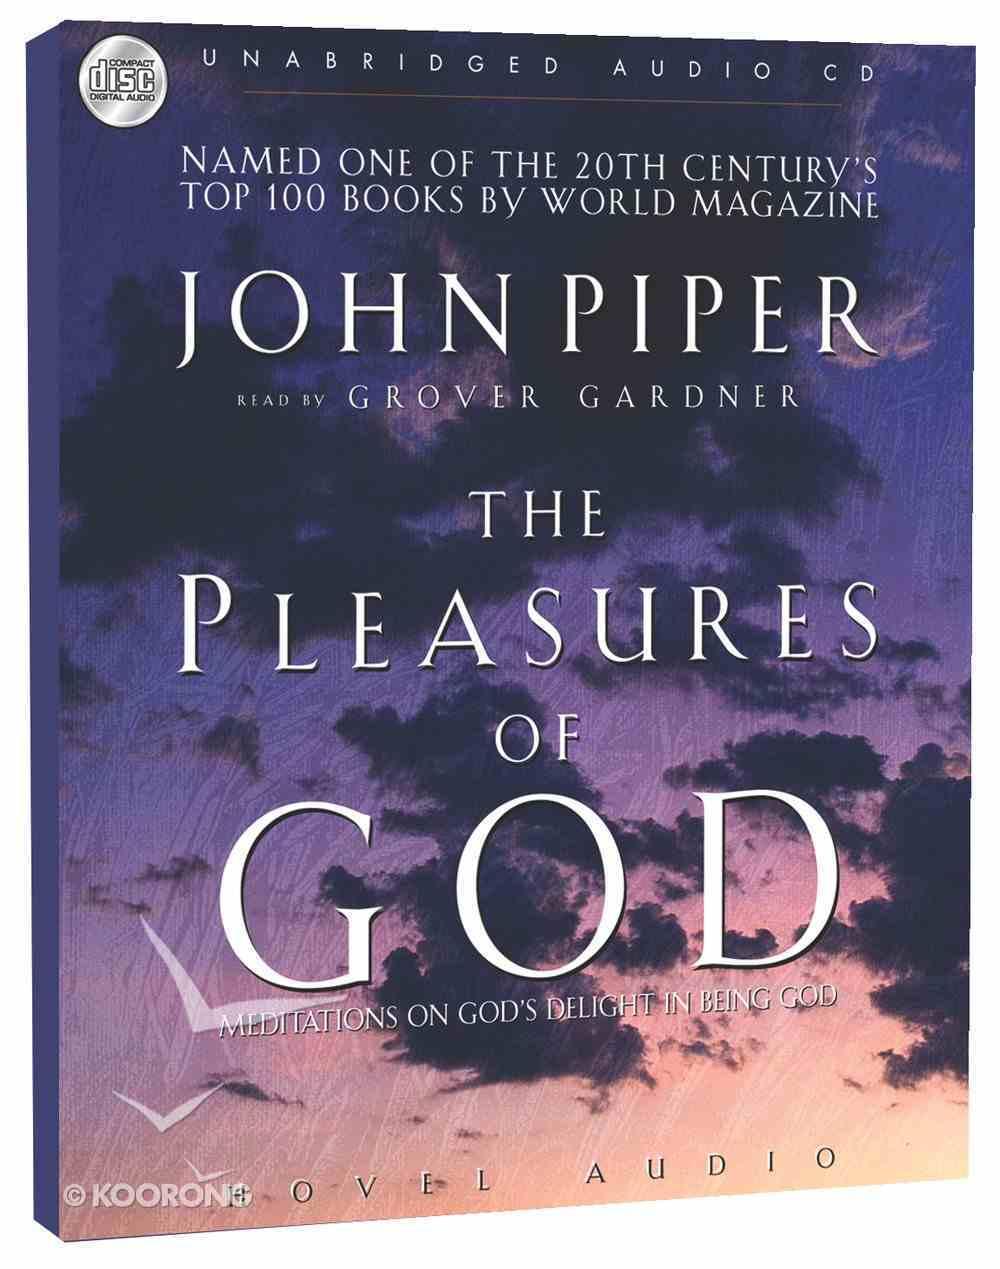 The Pleasures of God (Mp3) CD